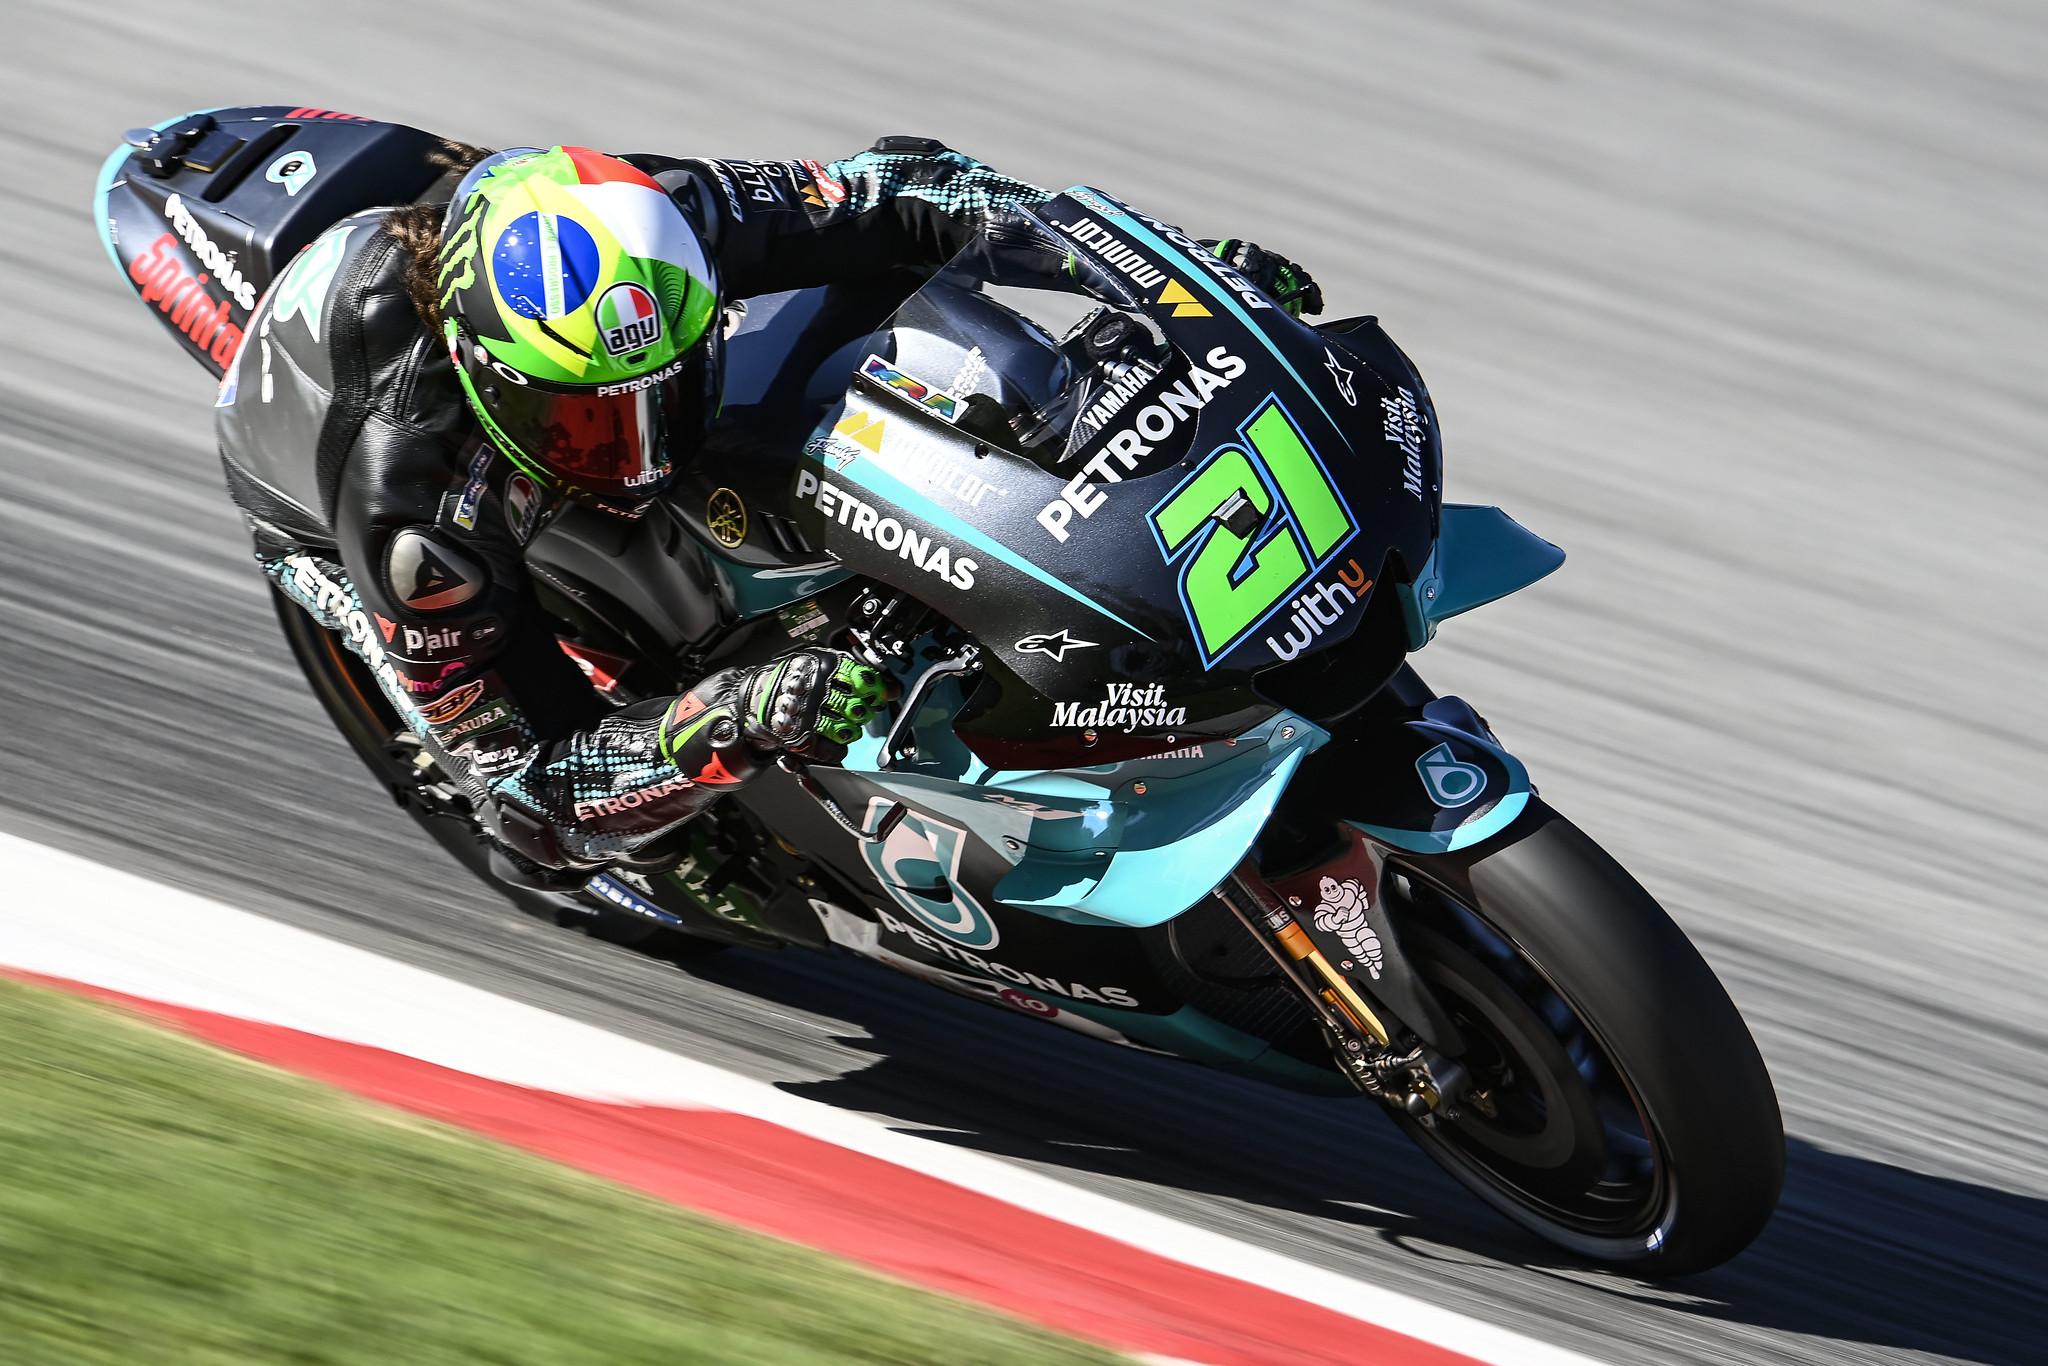 Pole para Franco Morbidelli con dominio casi total de Yamaha en Montmeló